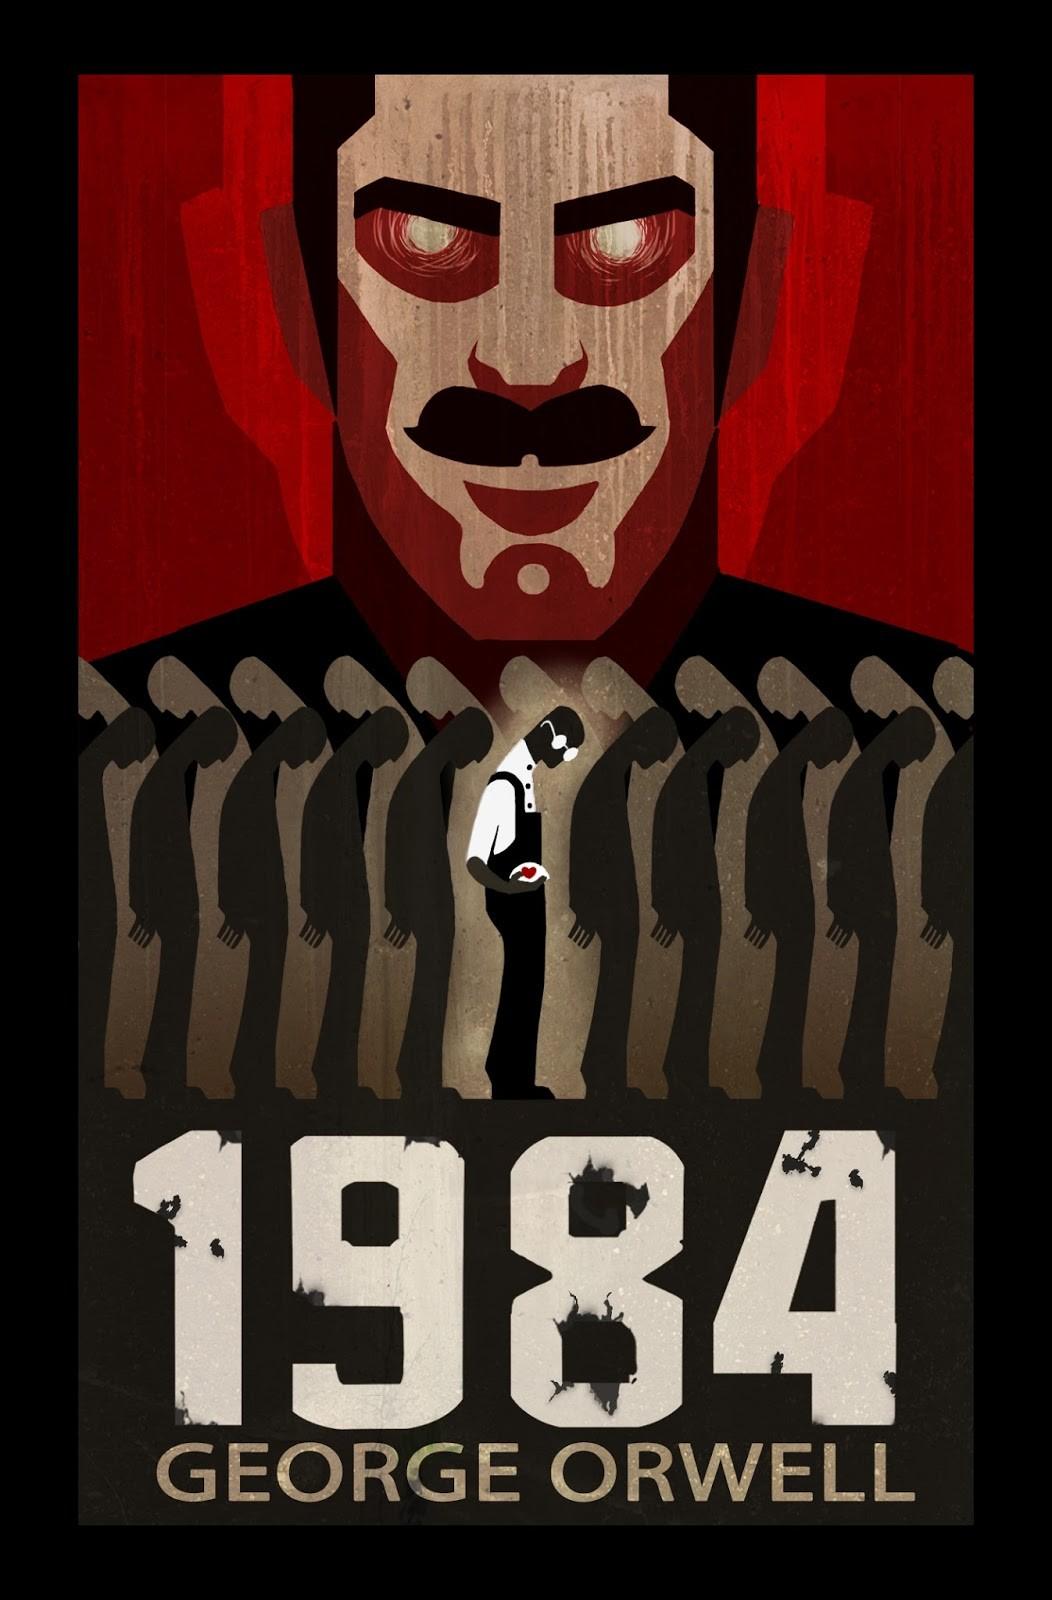 Why did George Orwell write 1984?